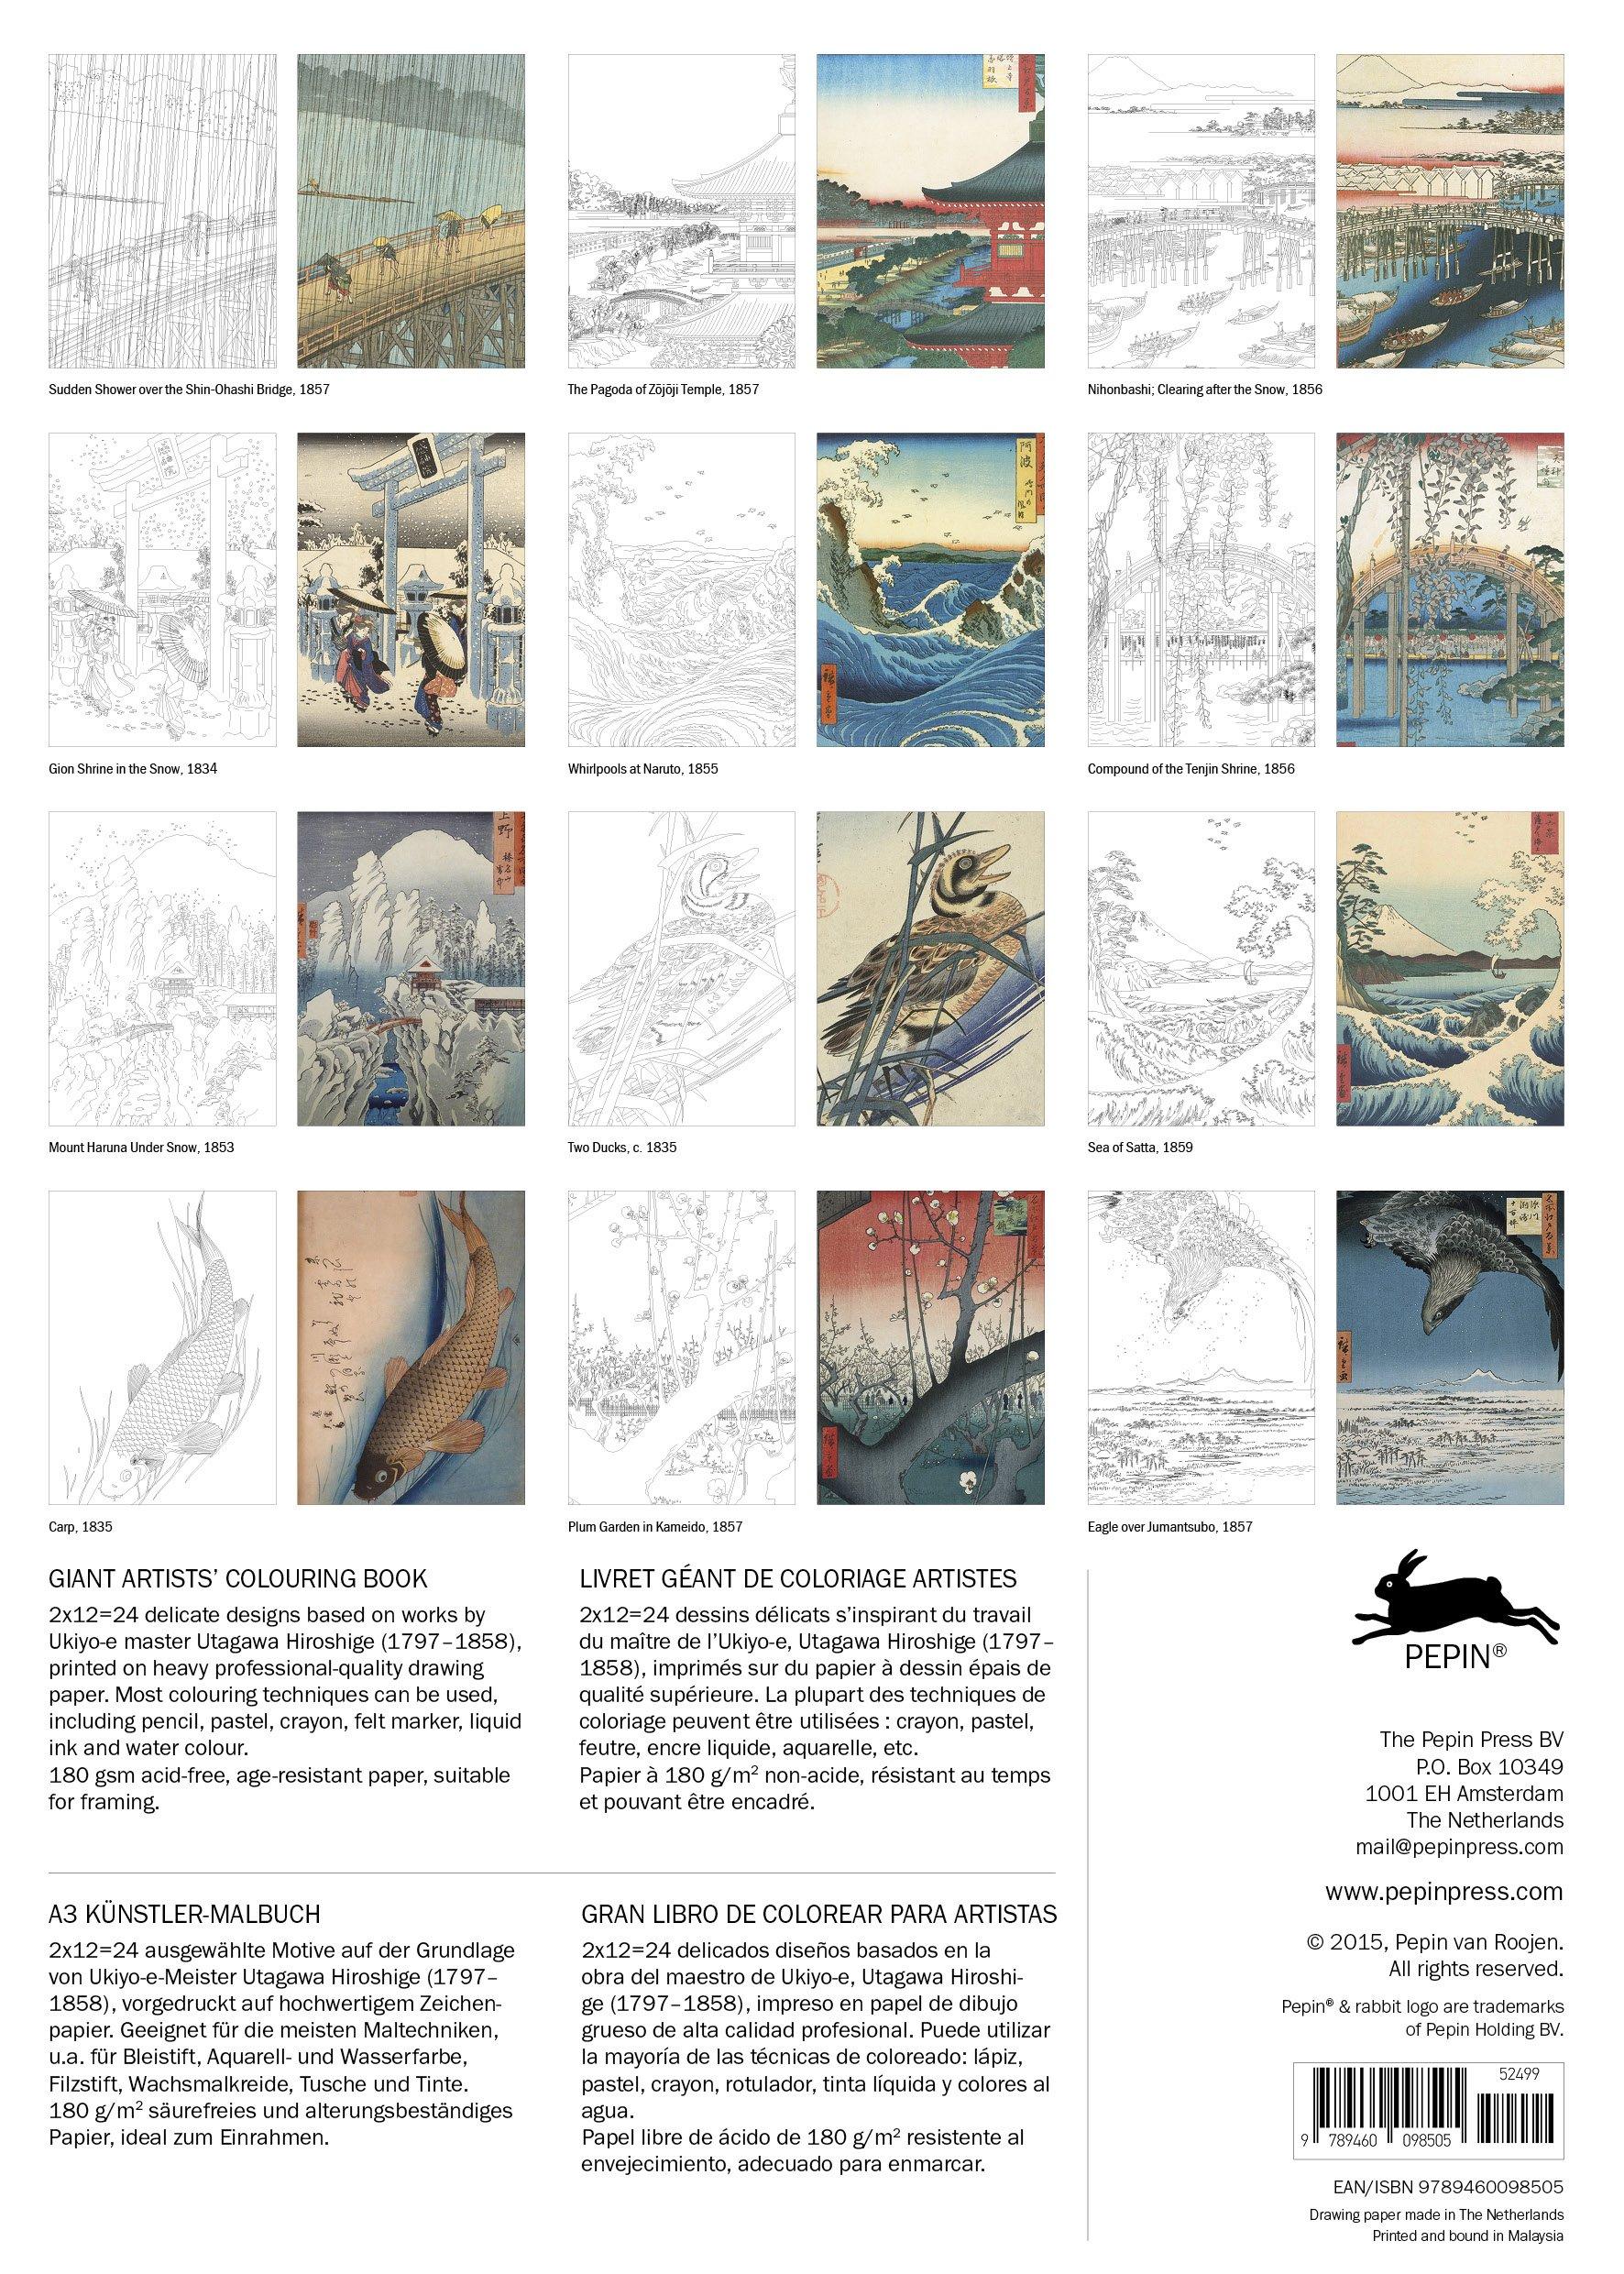 Coloring books for artists - Hiroshige Giant Artists Colouring Books Pepin Van Roojen 9789460098505 Amazon Com Books